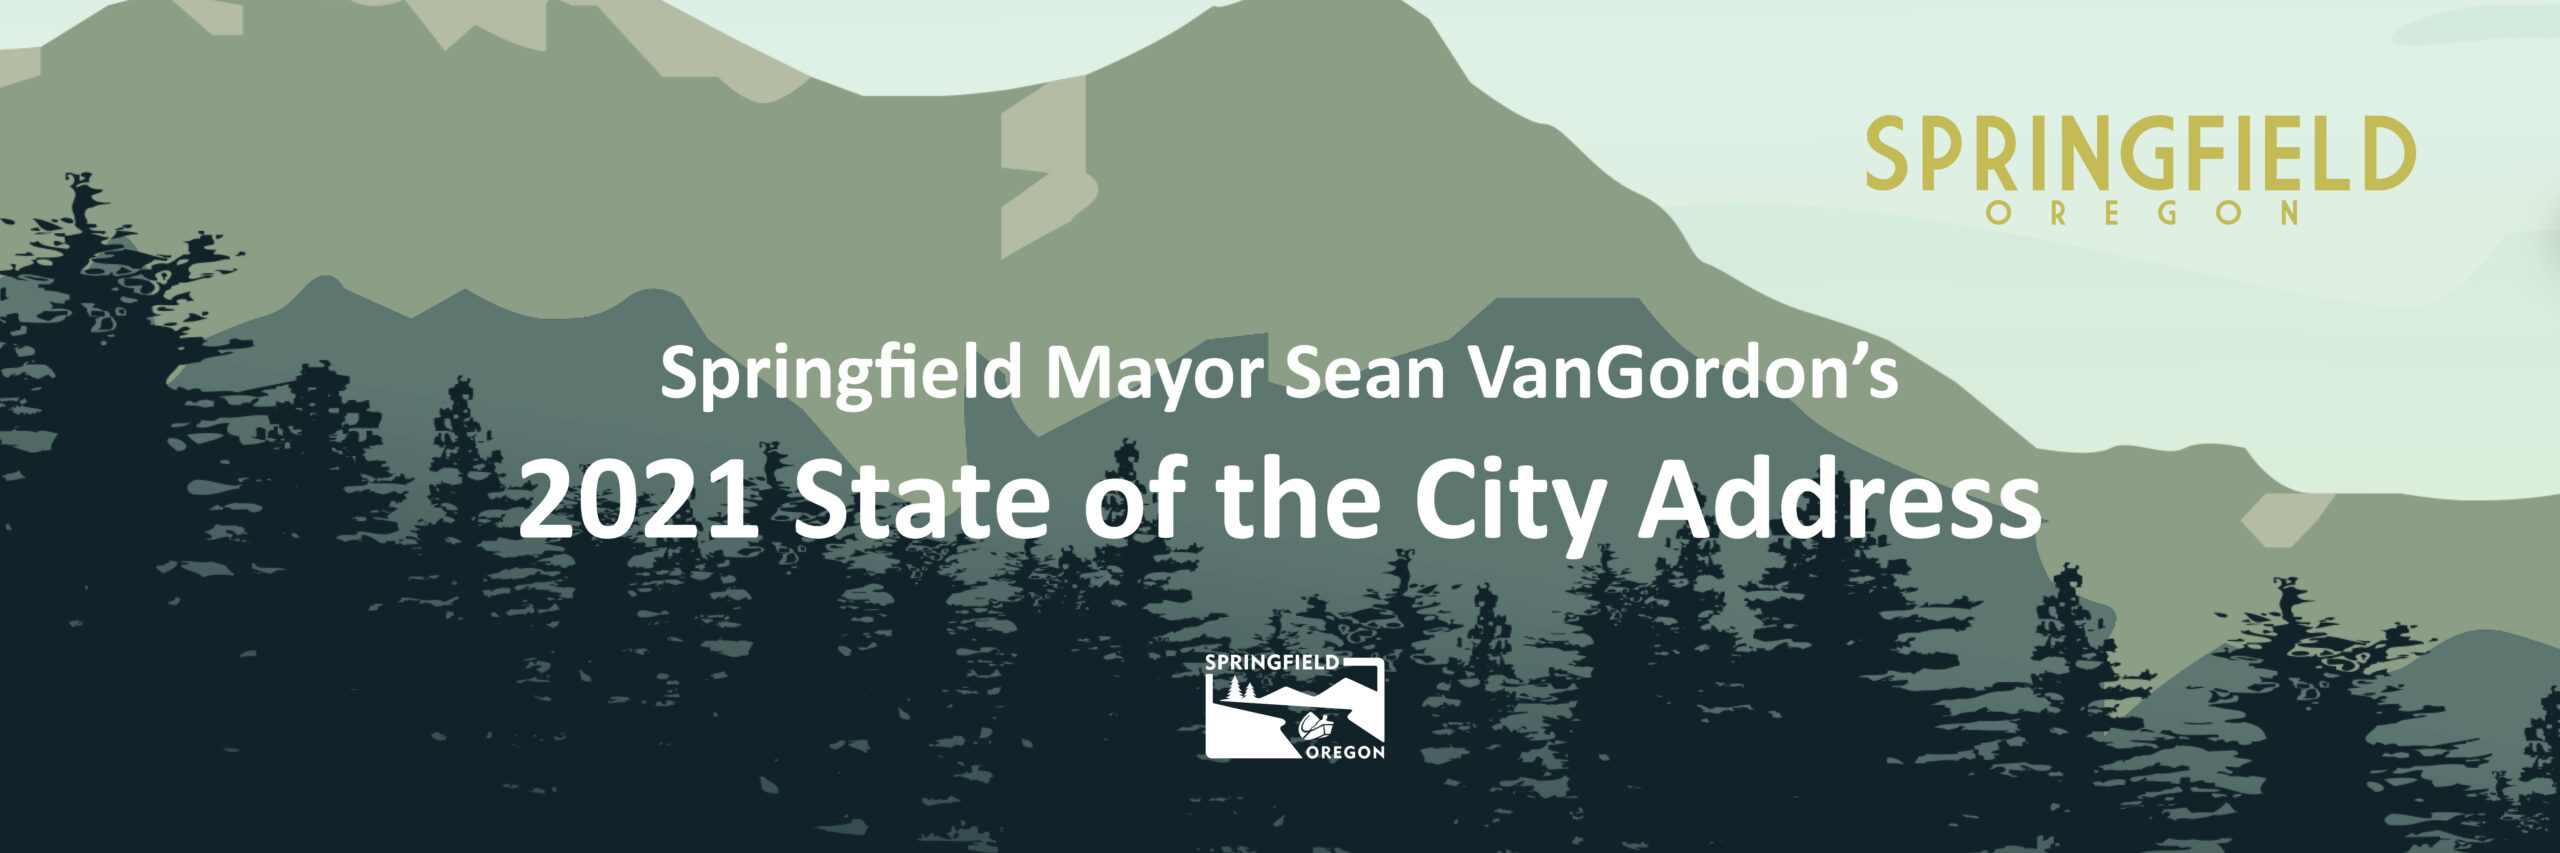 Interim Springfield Mayor Sean VanGordon's 2021 State of the City Banner